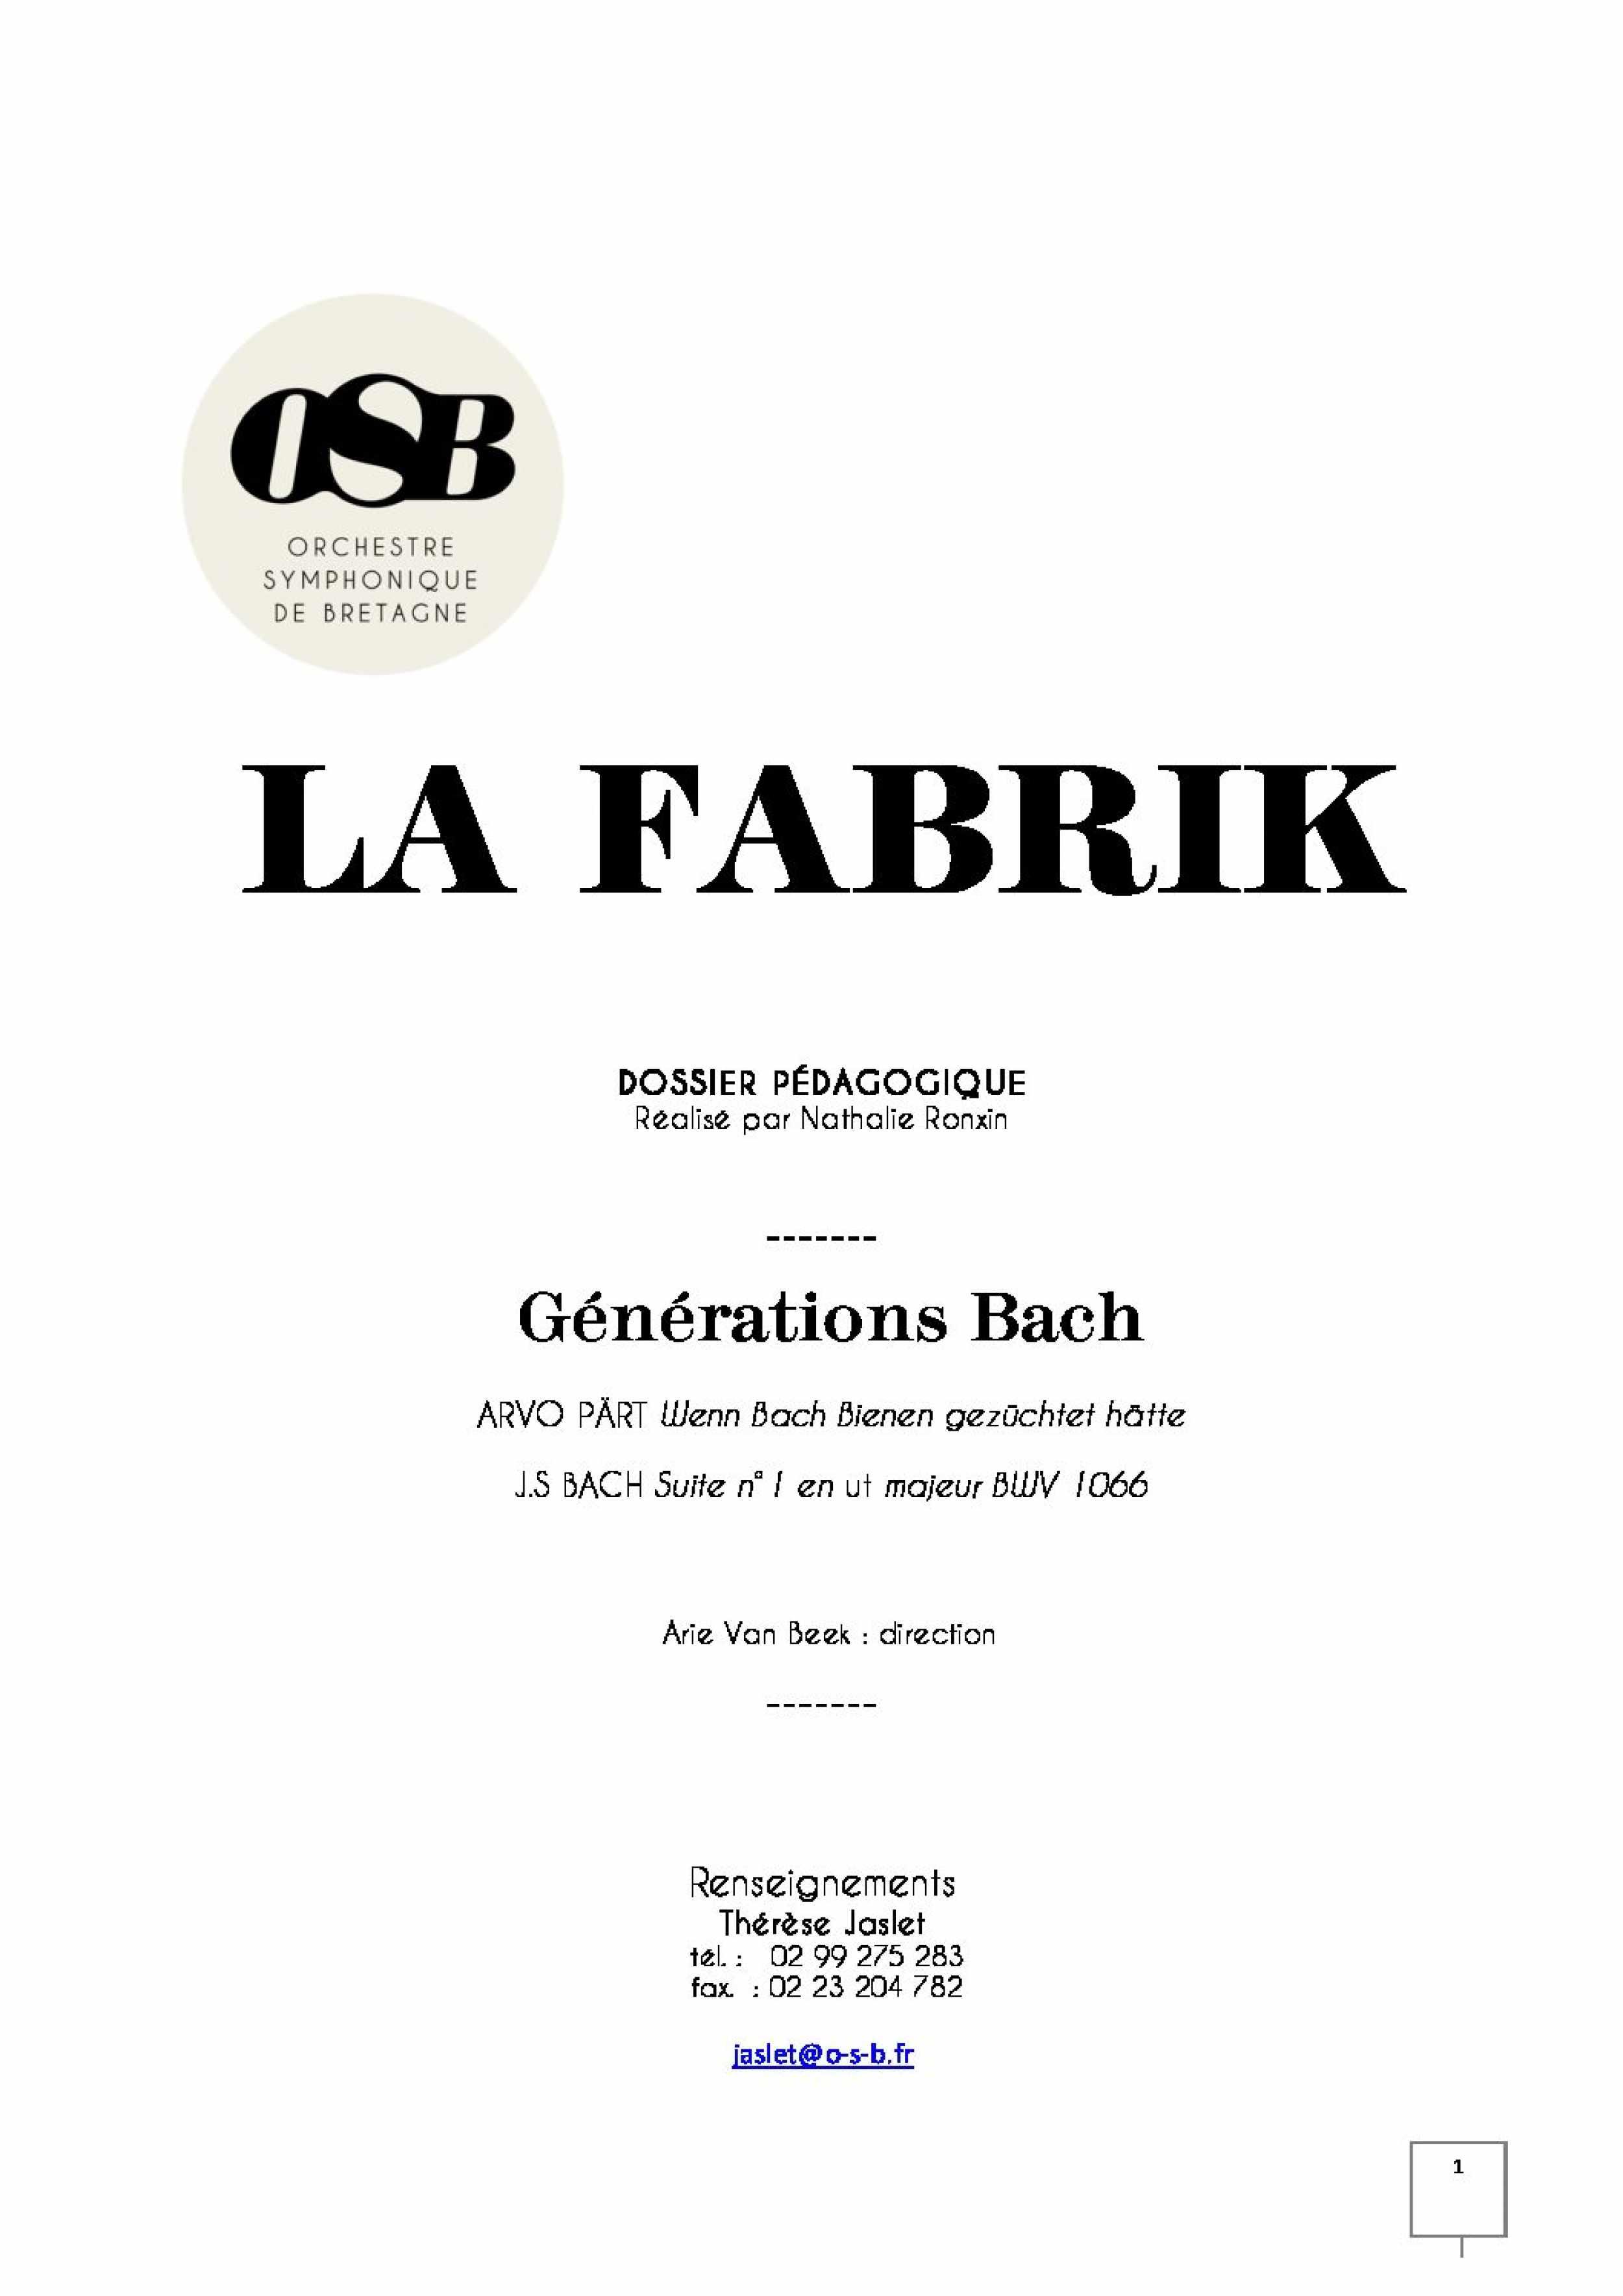 Generations Bach